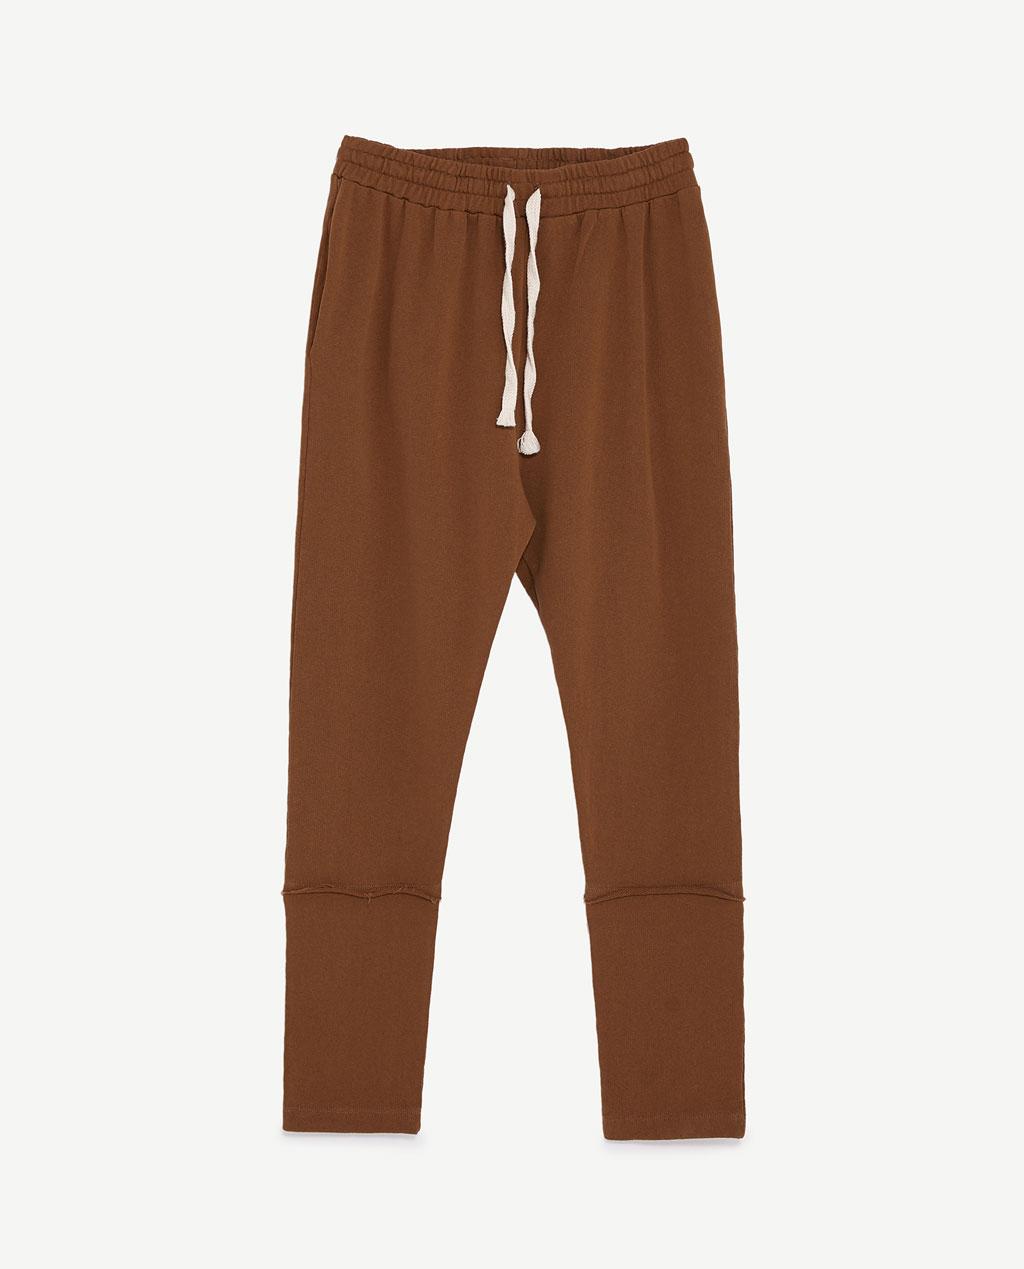 Pantaloni ungendered